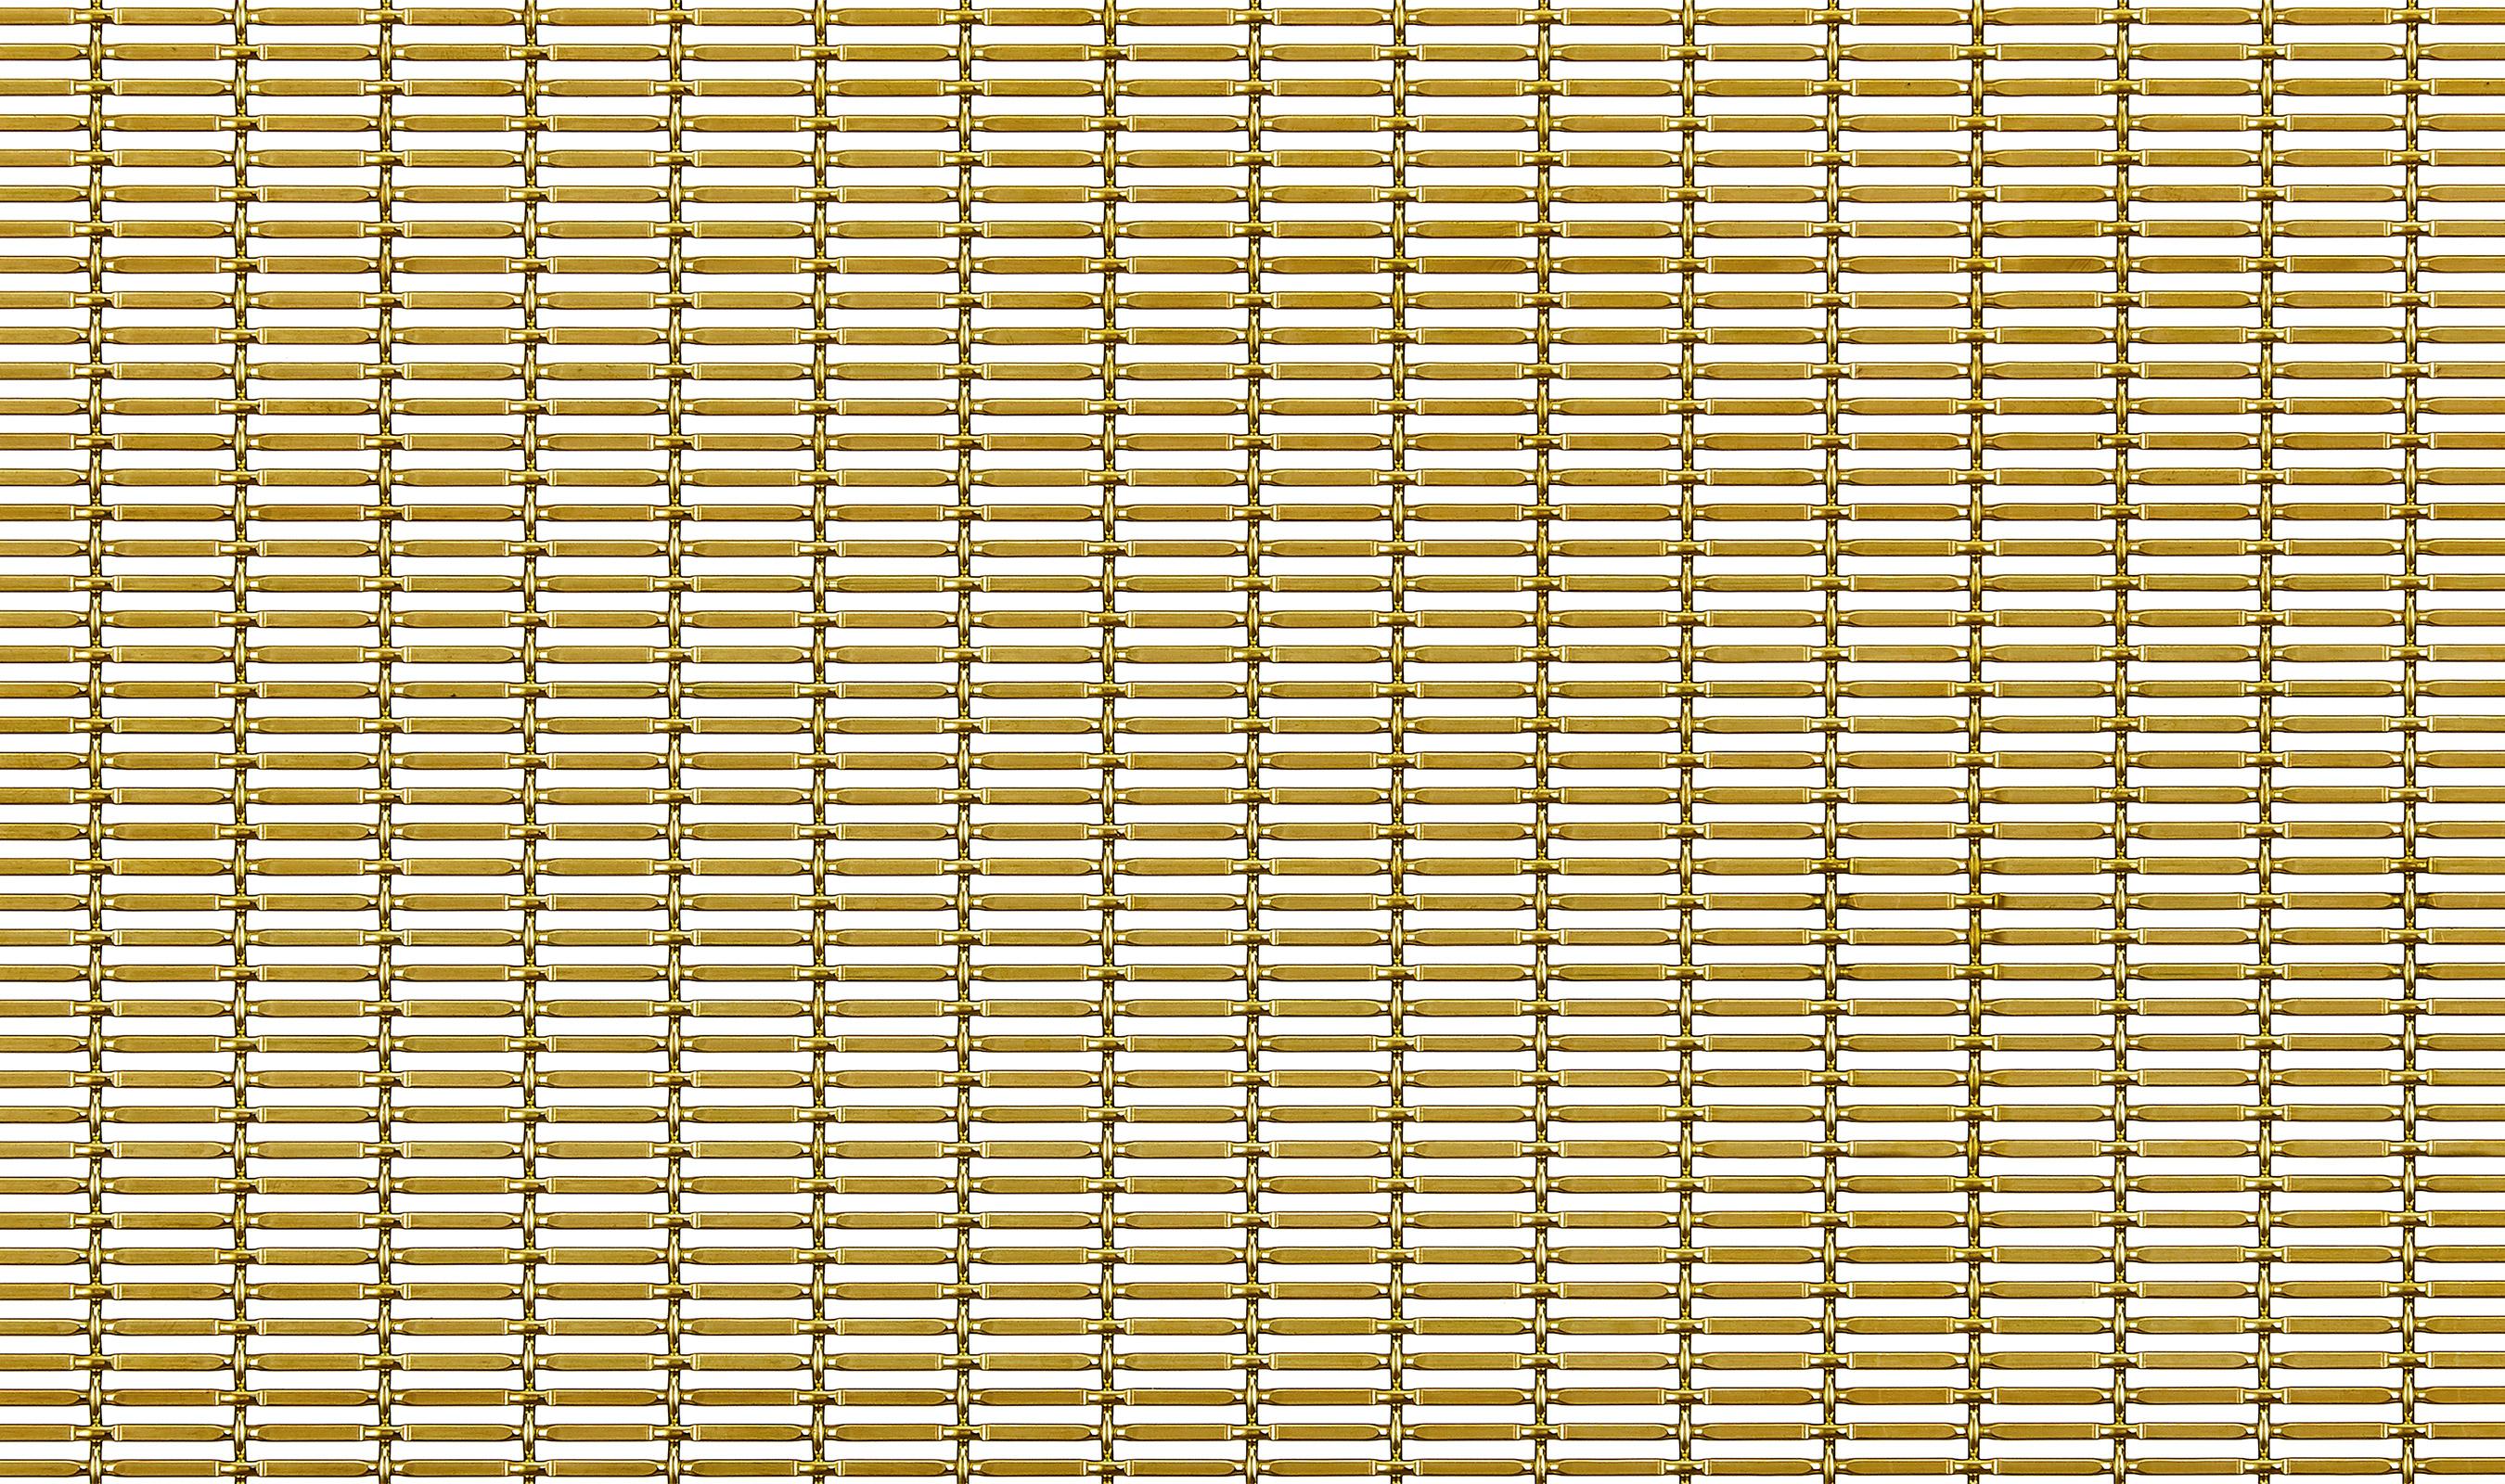 SPZ-52 architectural fine woven wire mesh in brass